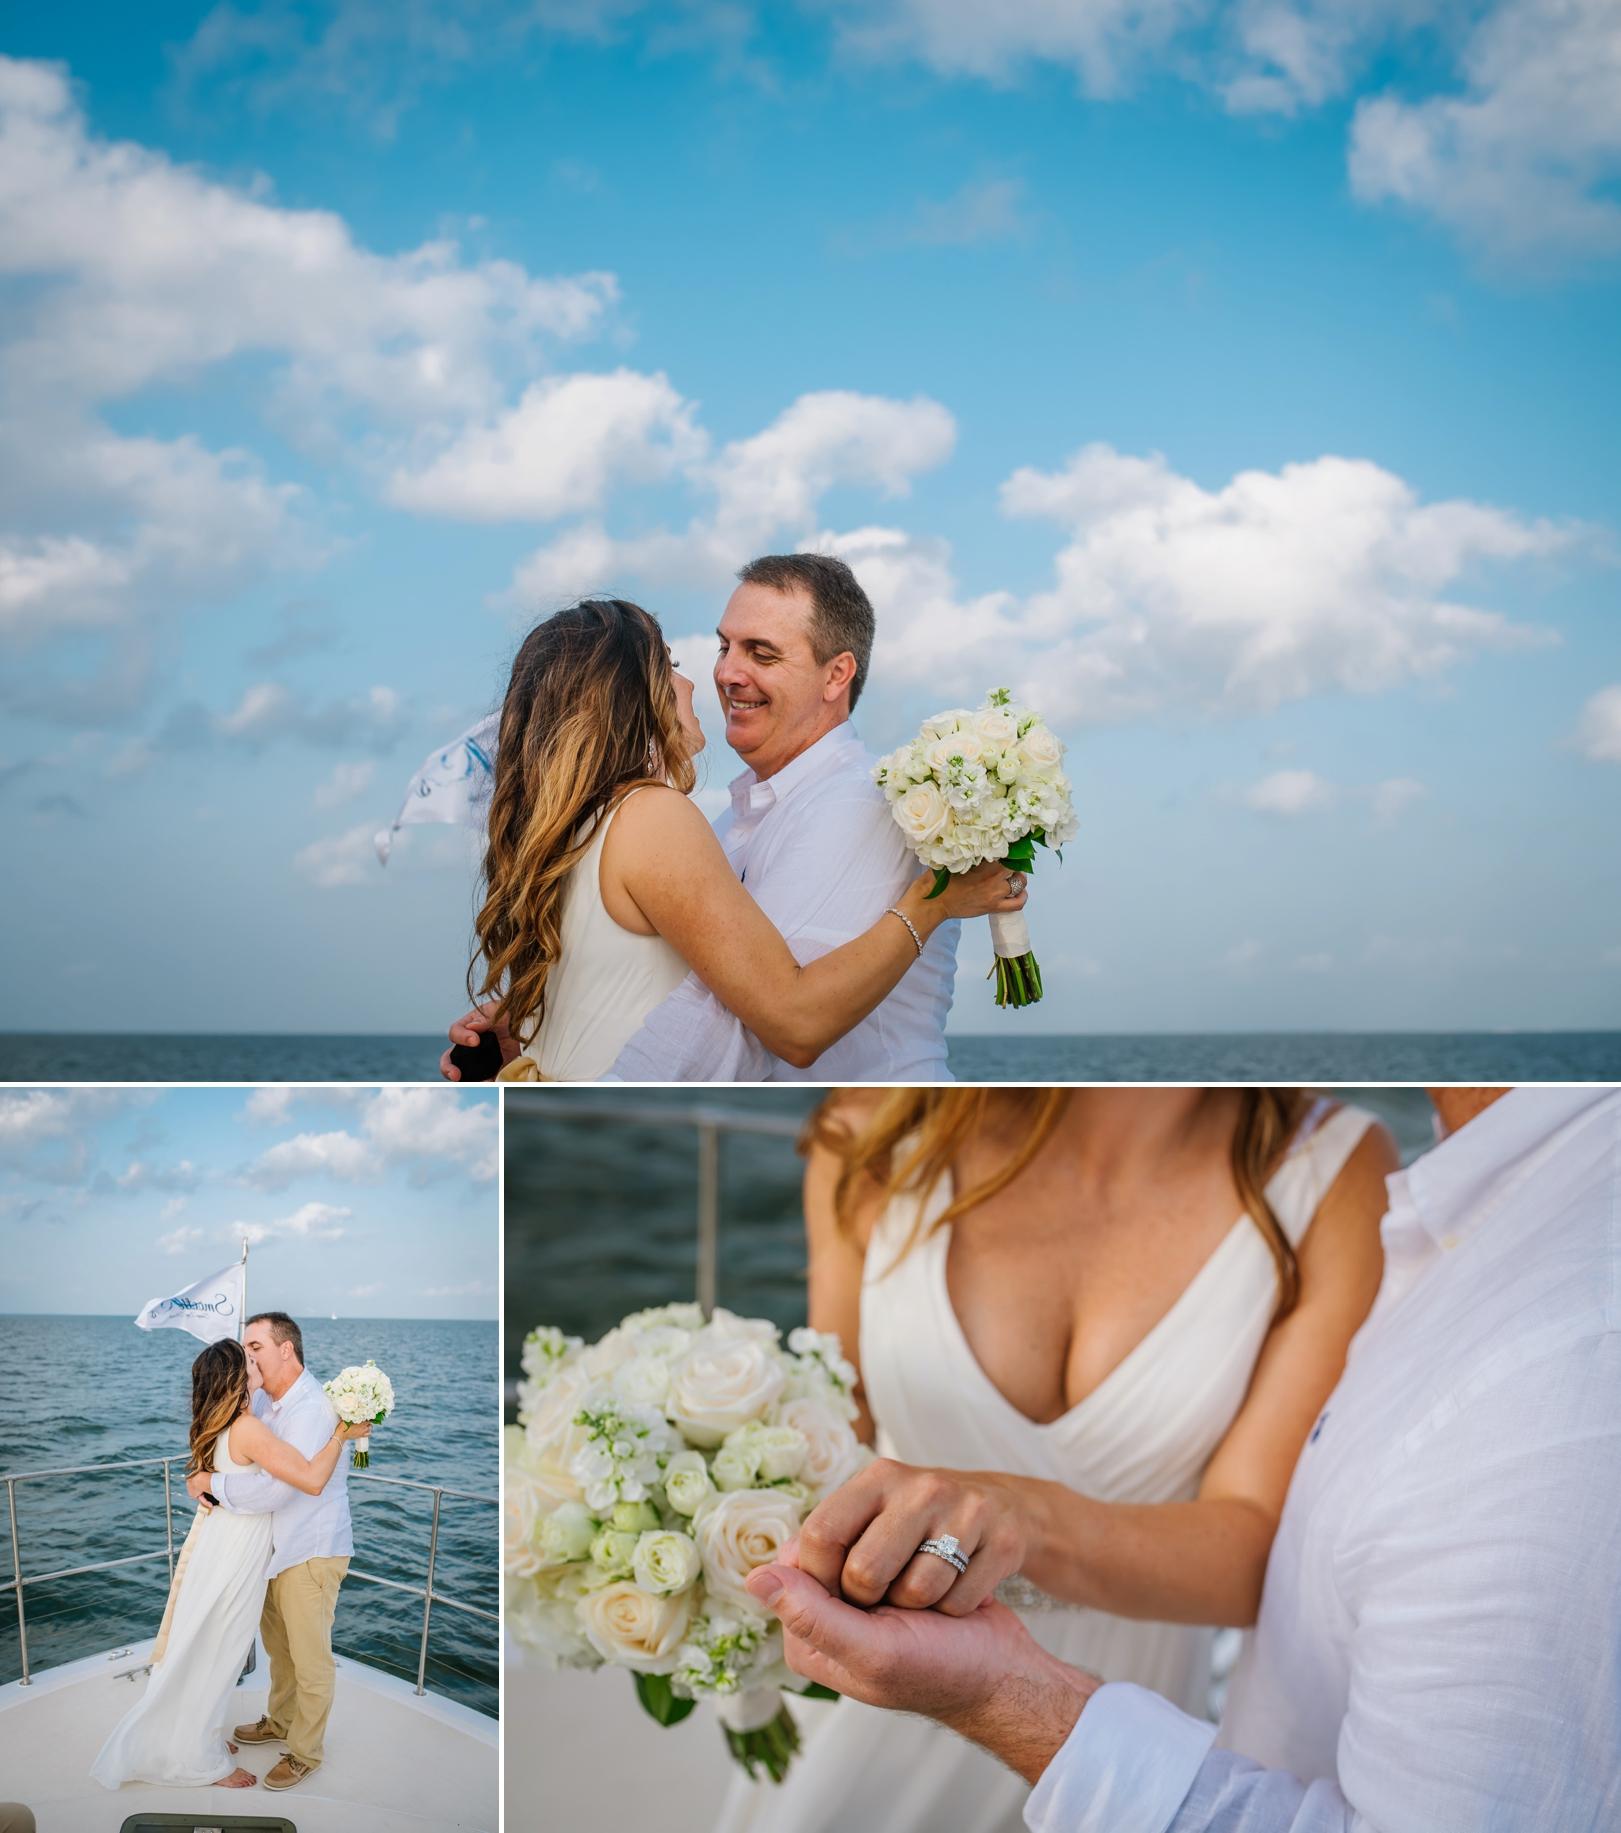 tampa-wedding-photography-boat-cruise-wedding-ceremony_0010.jpg